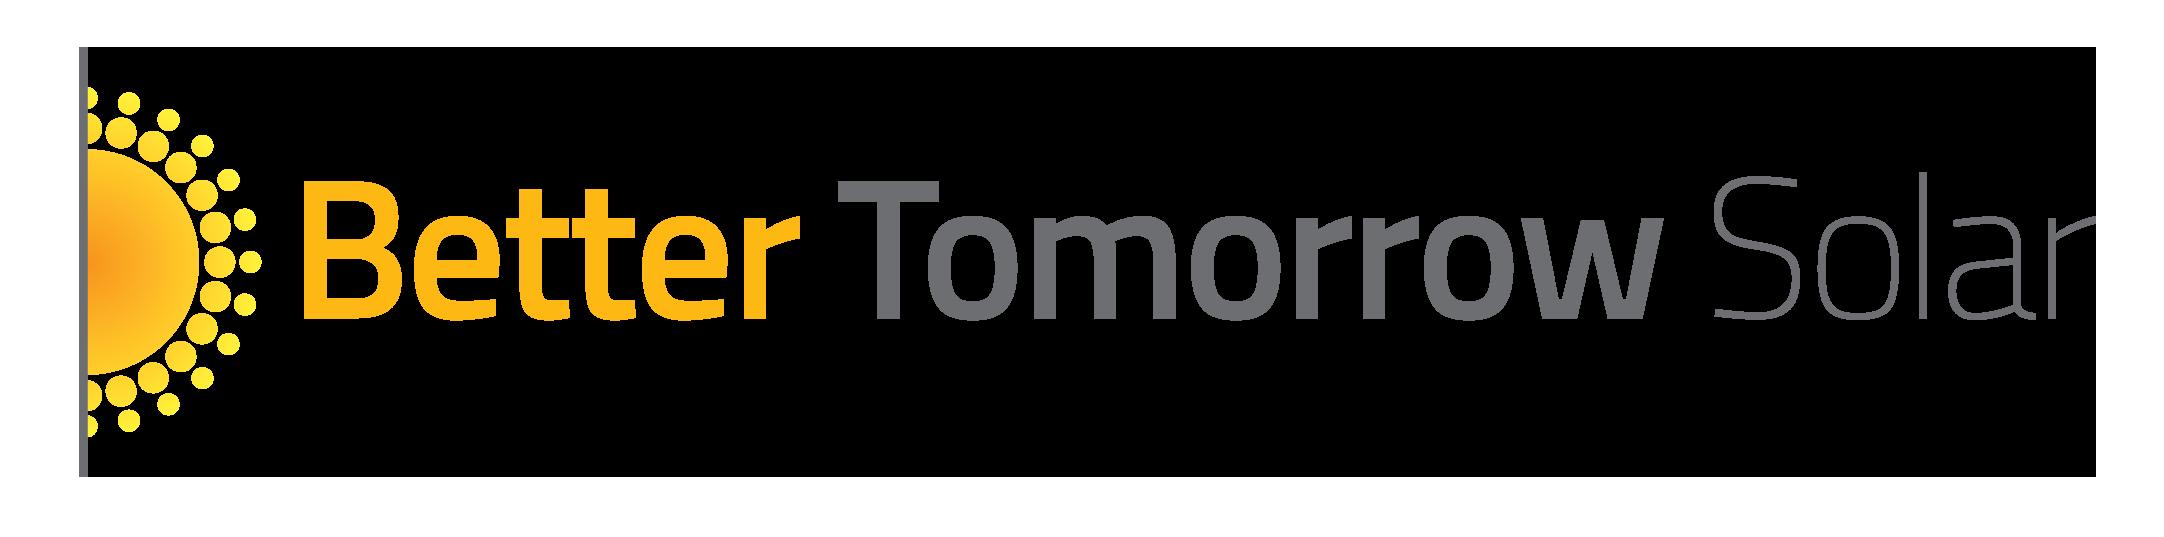 Better Tomorrow Solar logo